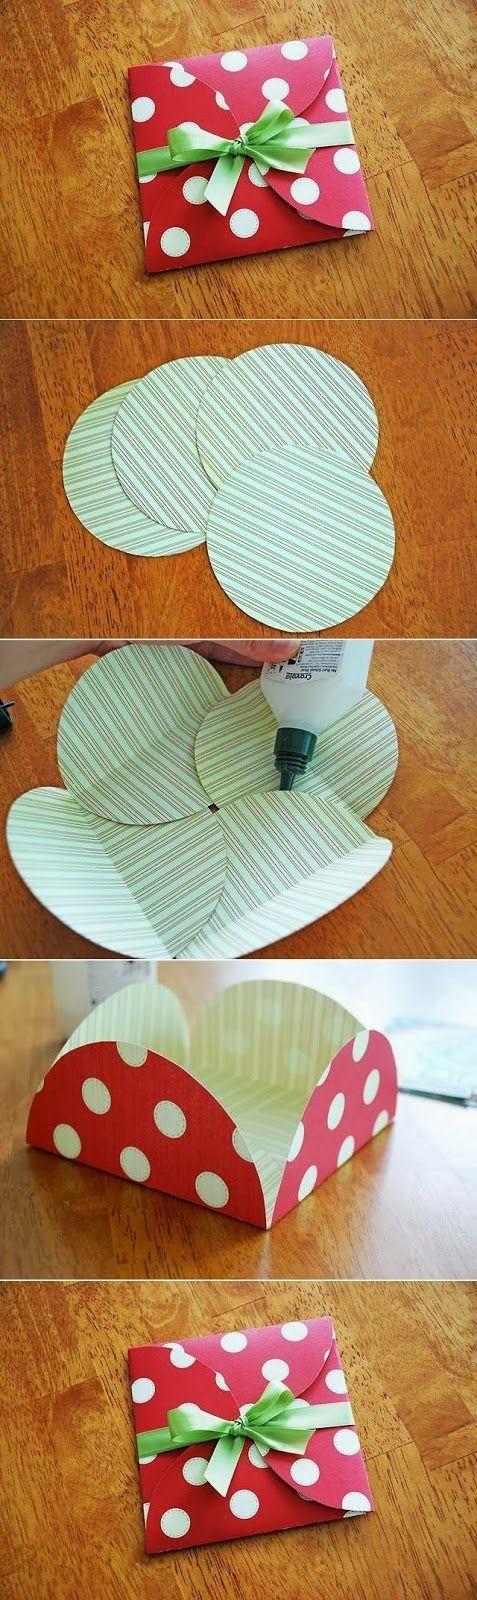 ↔↖↔↗ Make a Simple Beautiful Envelope